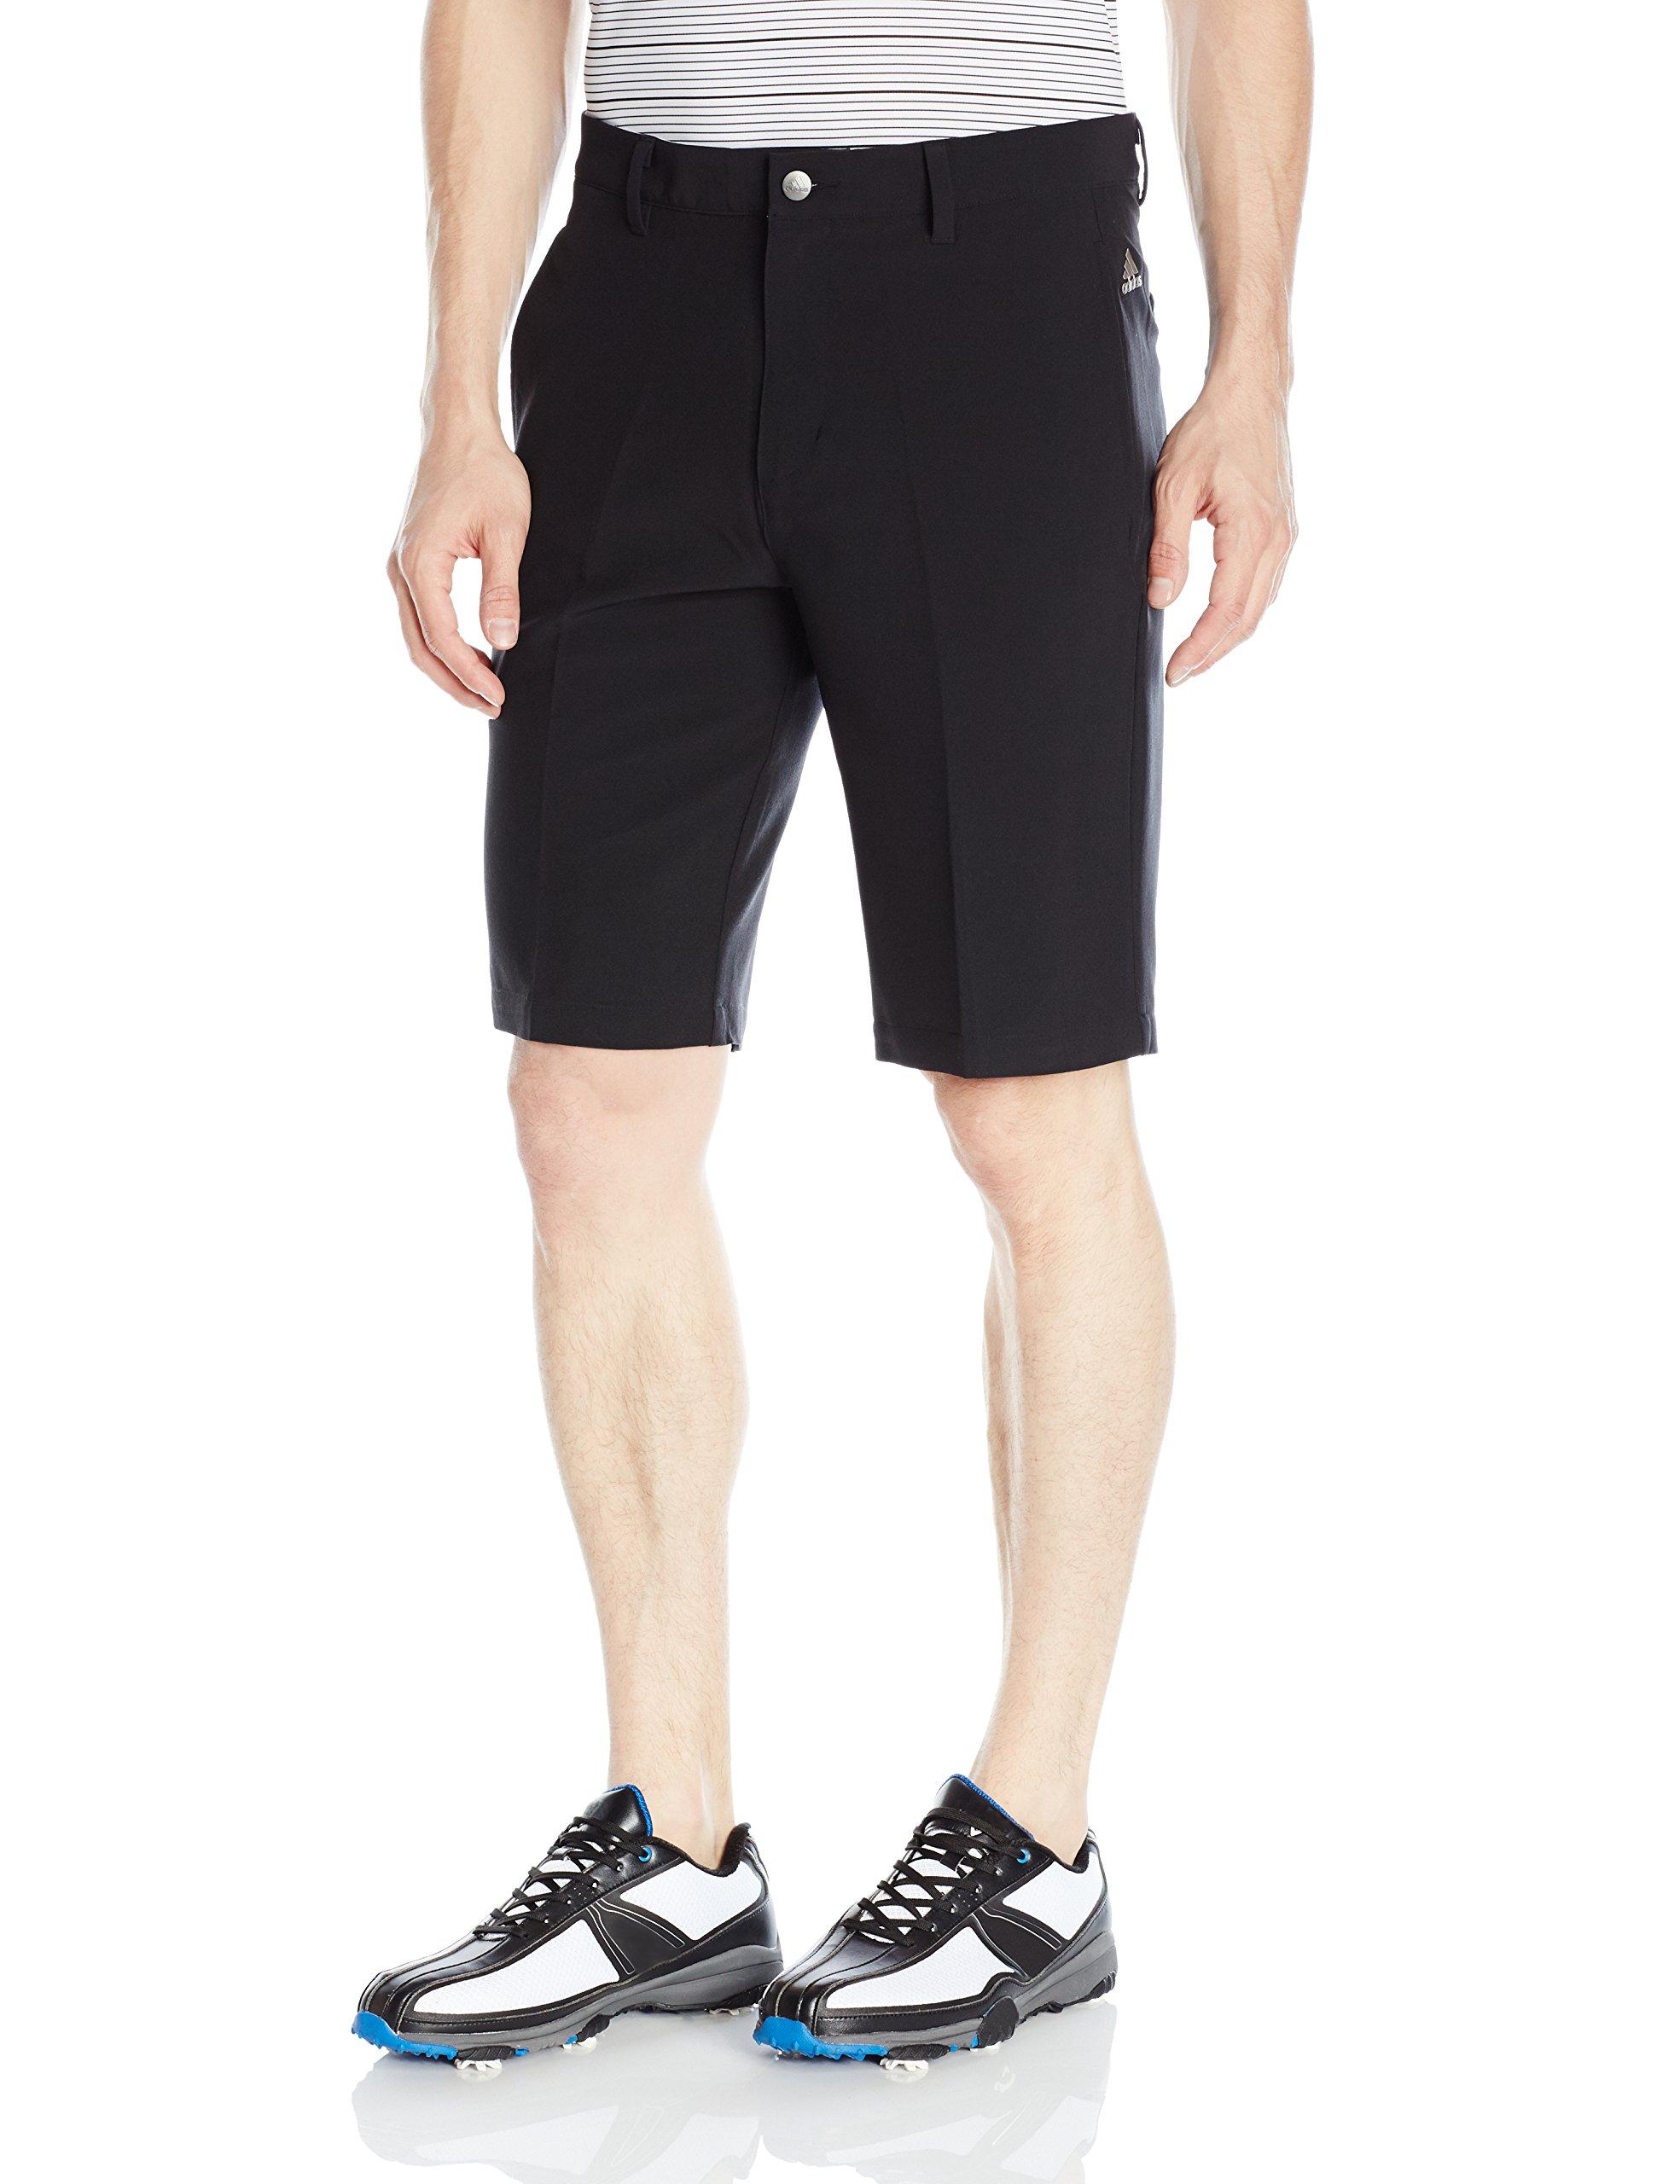 adidas Golf Ultimate+ 3-Stripes Short, Black, 40'' by adidas